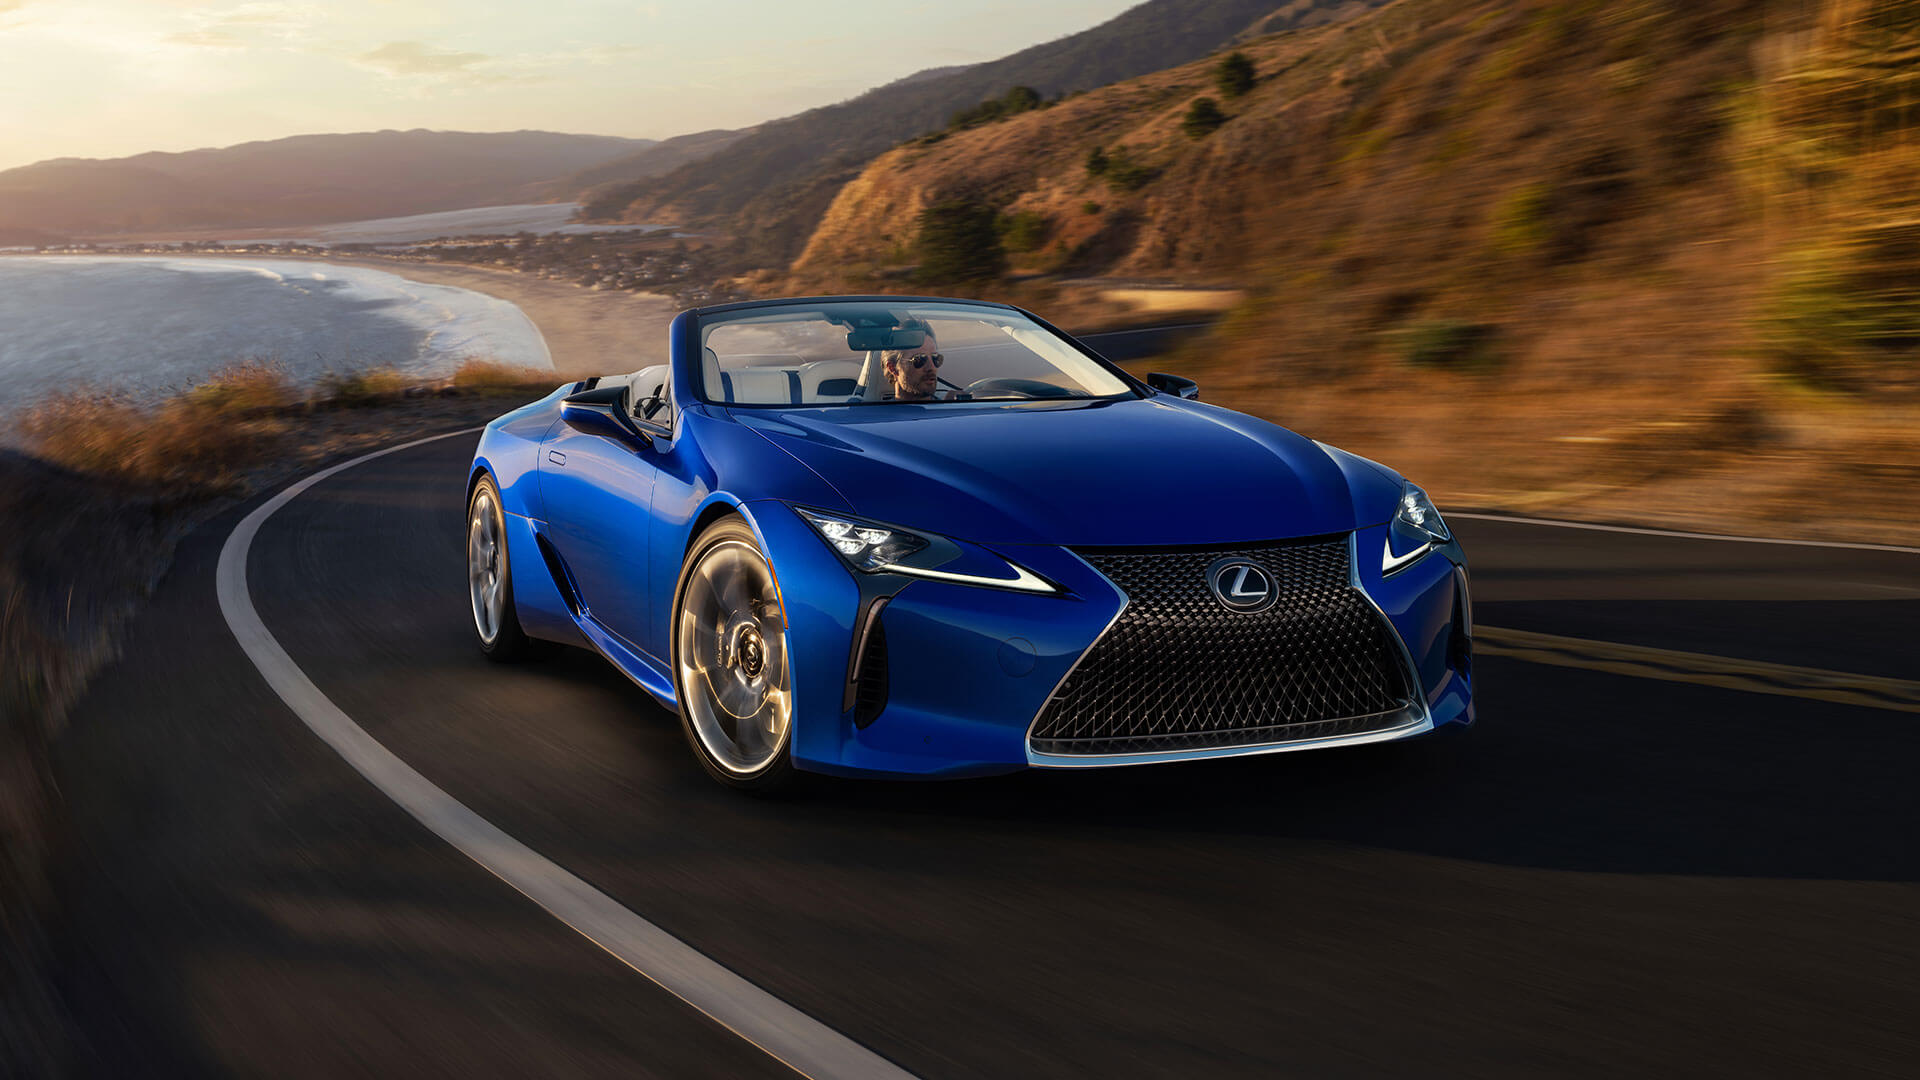 LC Convertible Best Luxury Car Award 010